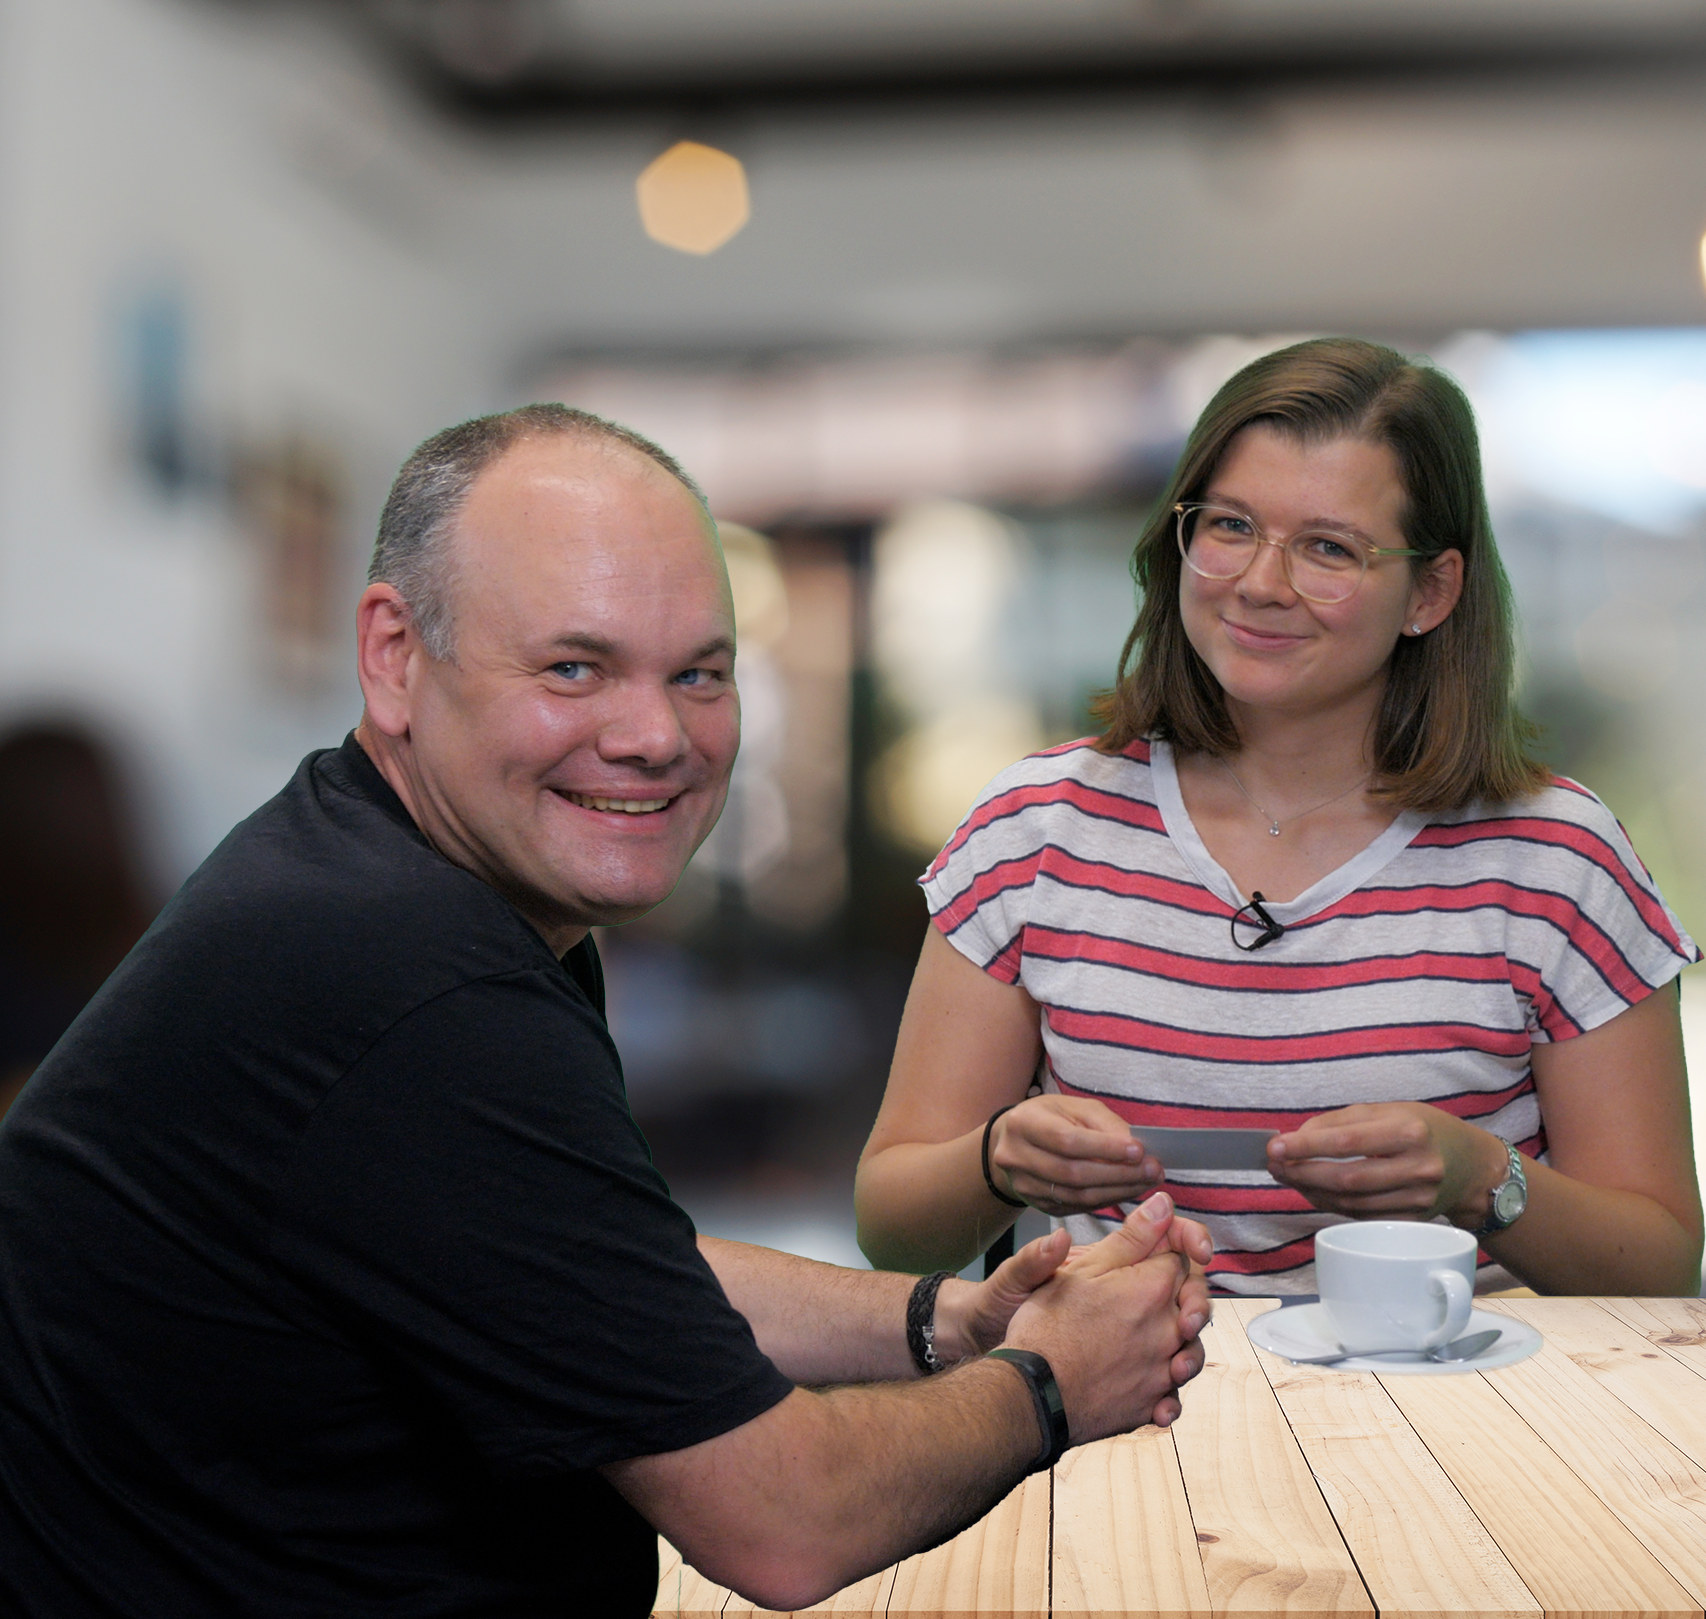 Martin Ebner & Katharina Hohla